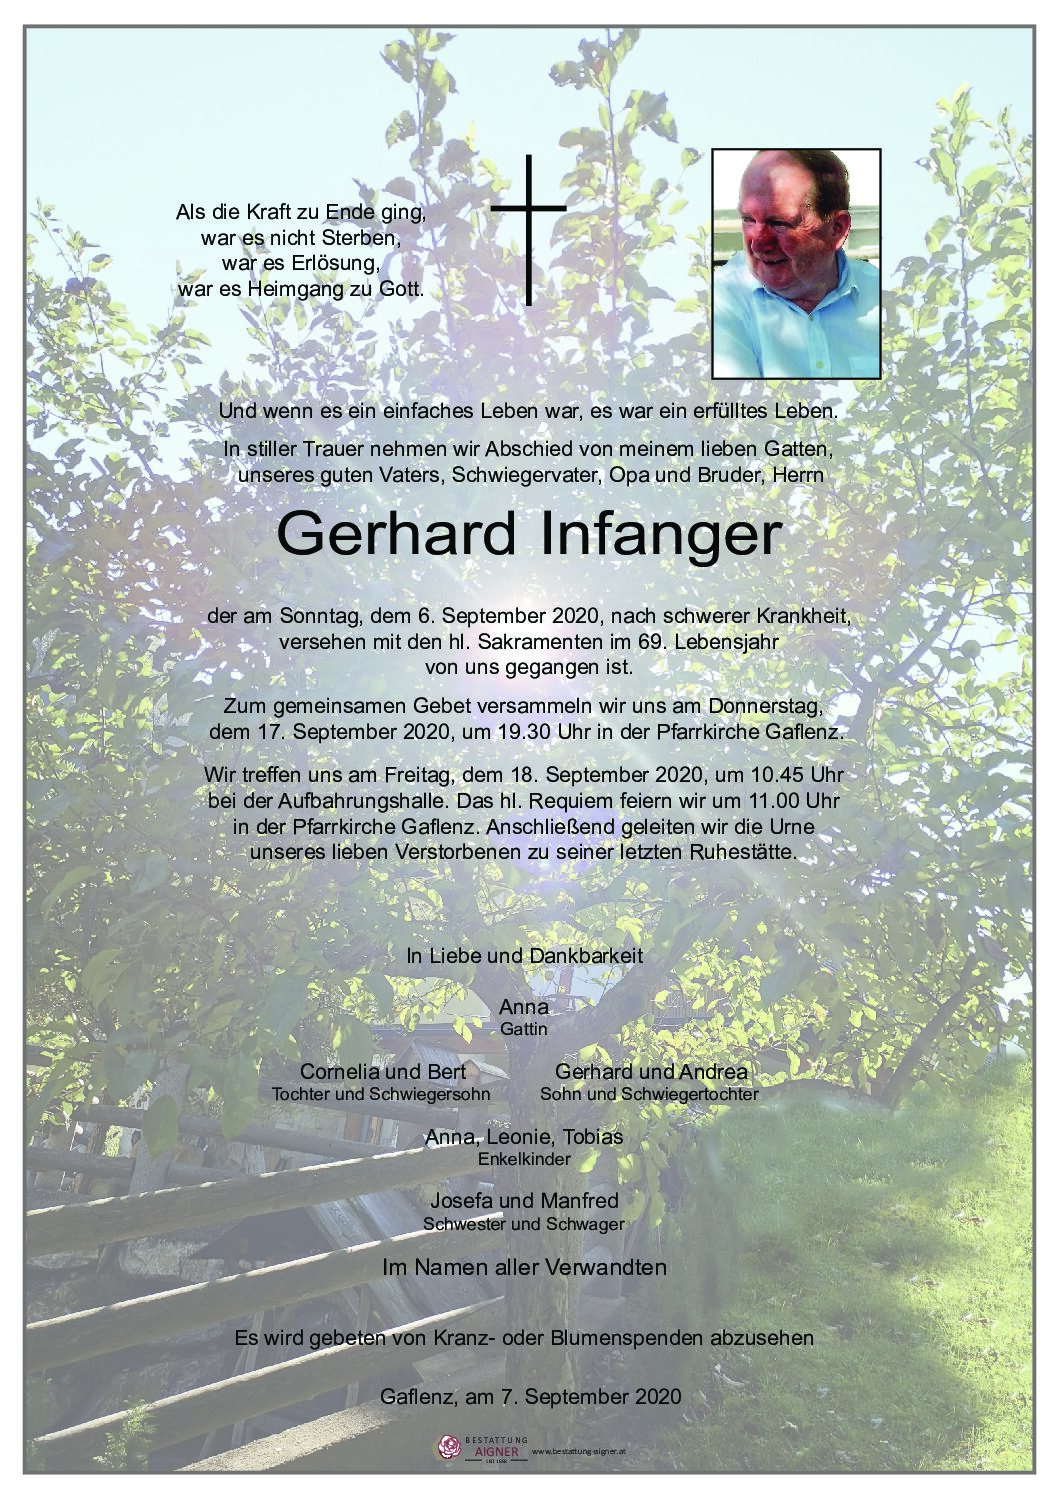 Gerhard Infanger